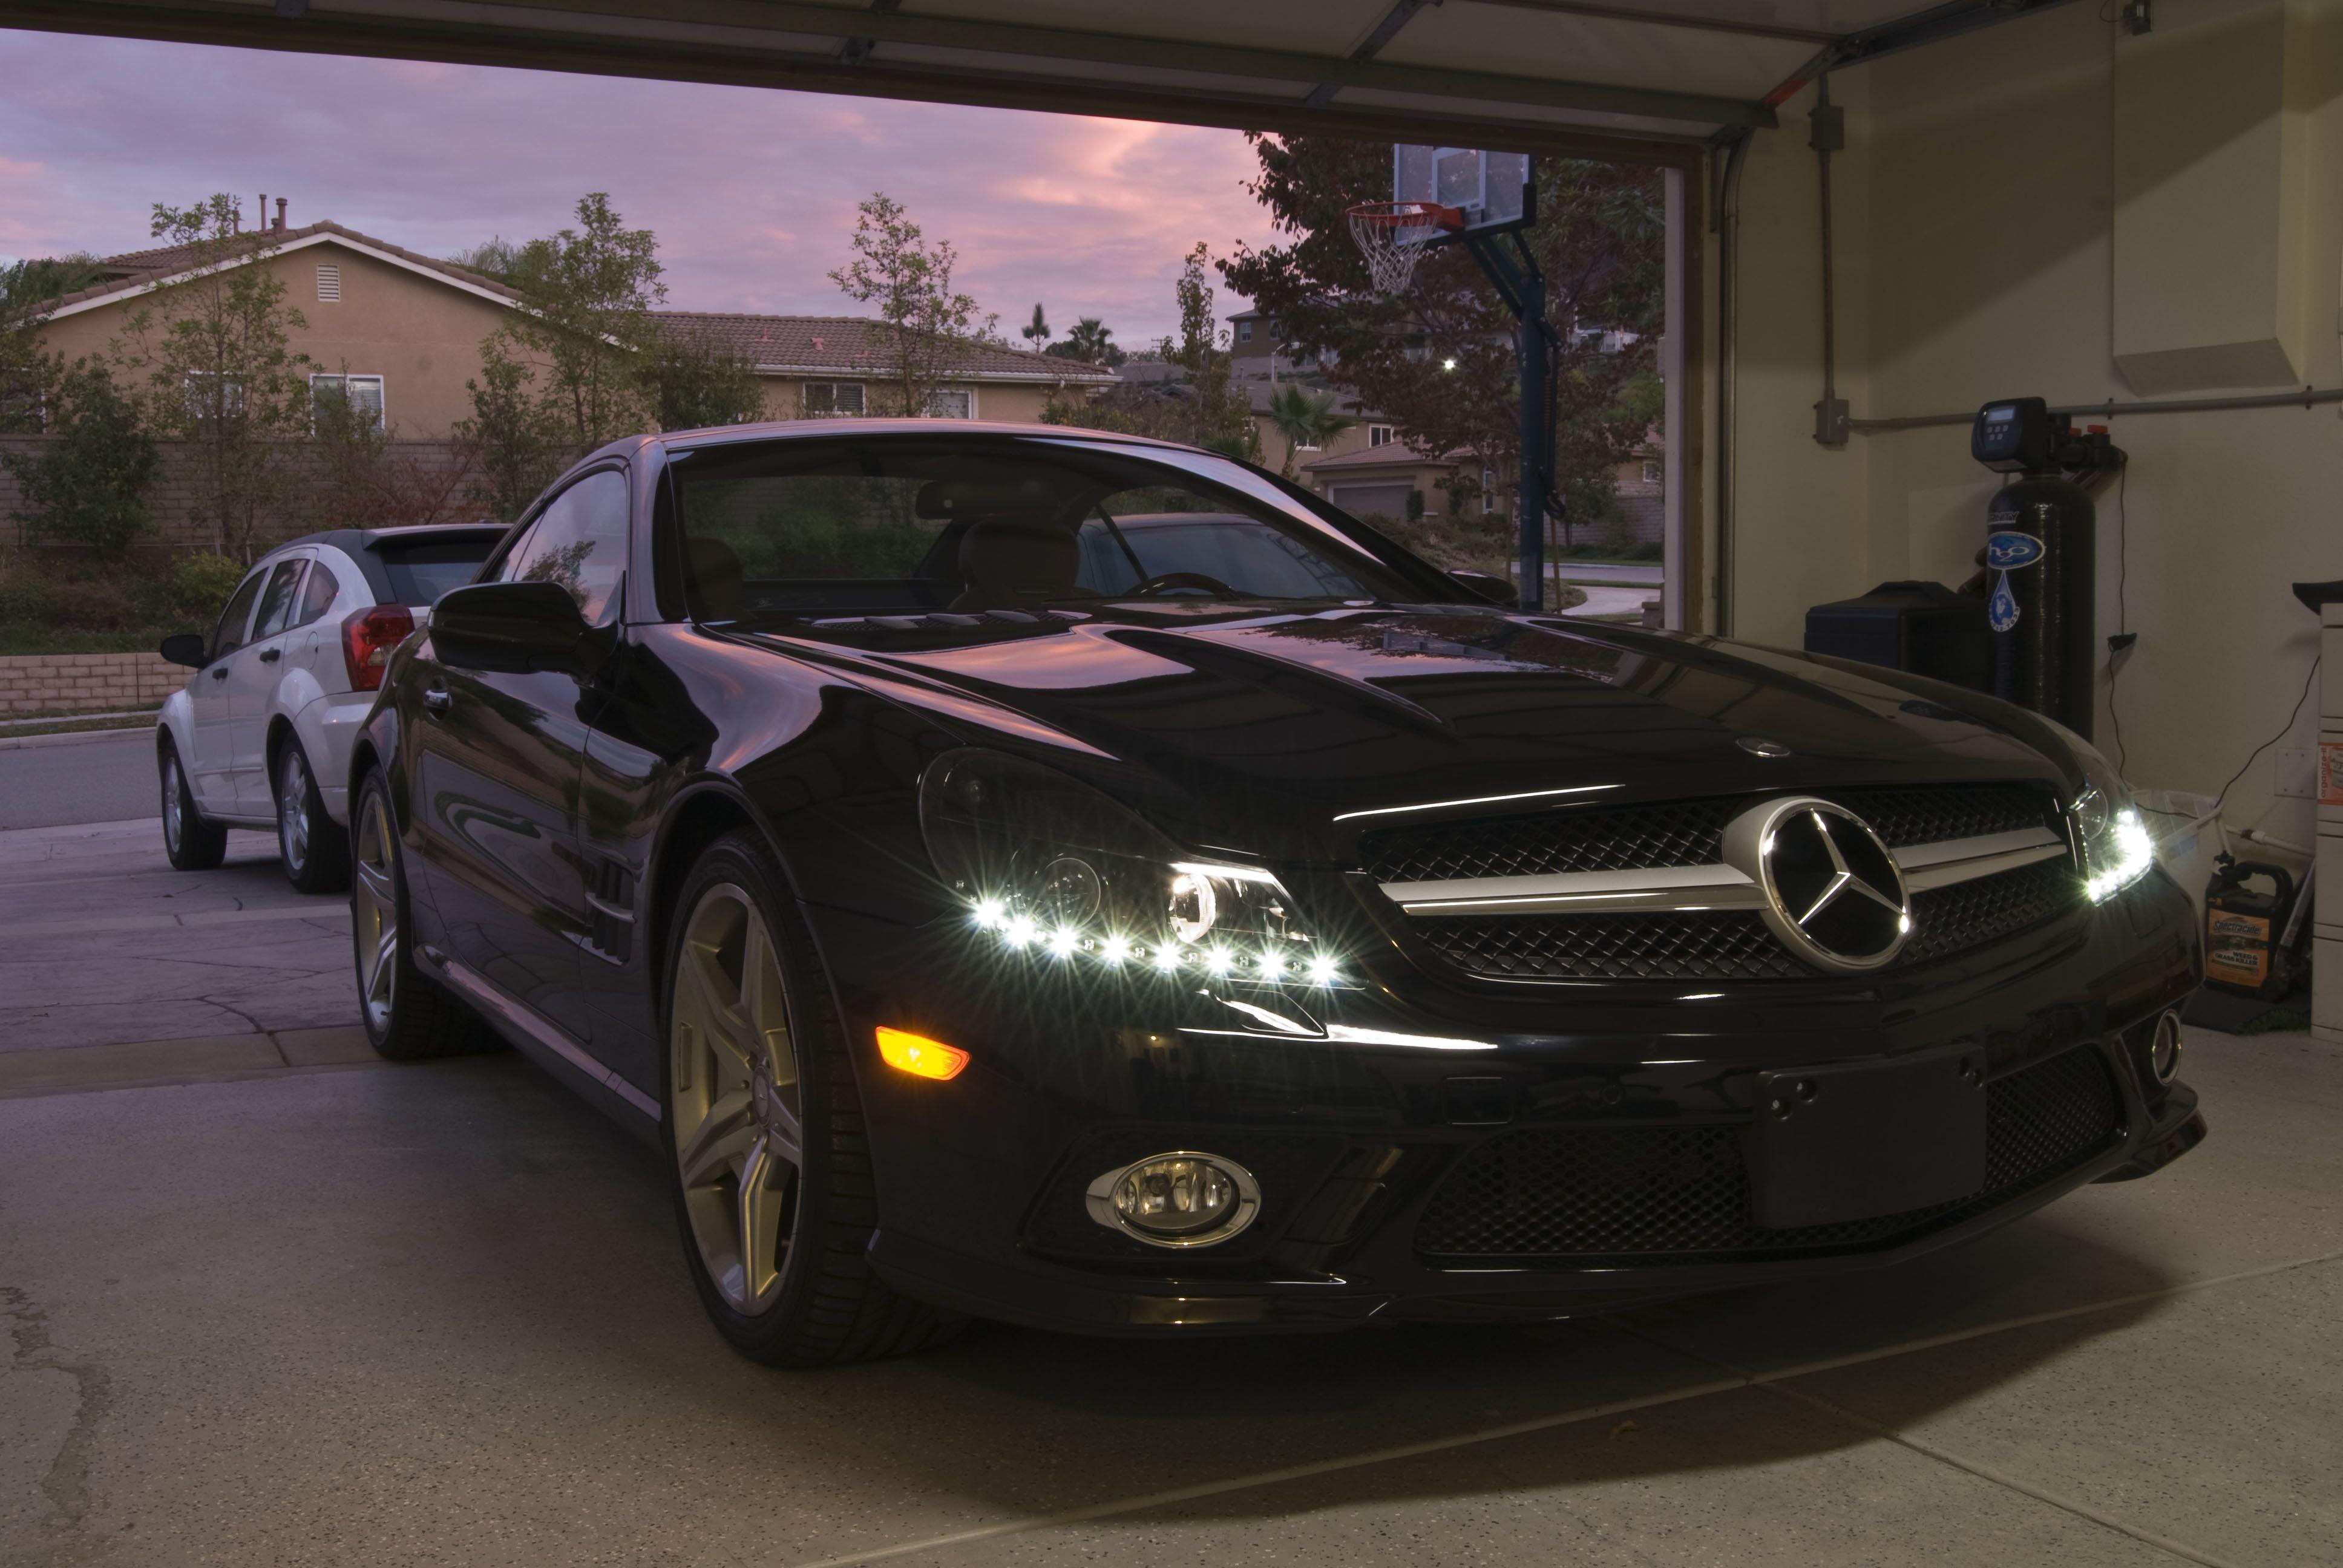 Mercedes sl550 custom led headlights mercedes benz for Mercedes benz aftermarket headlights